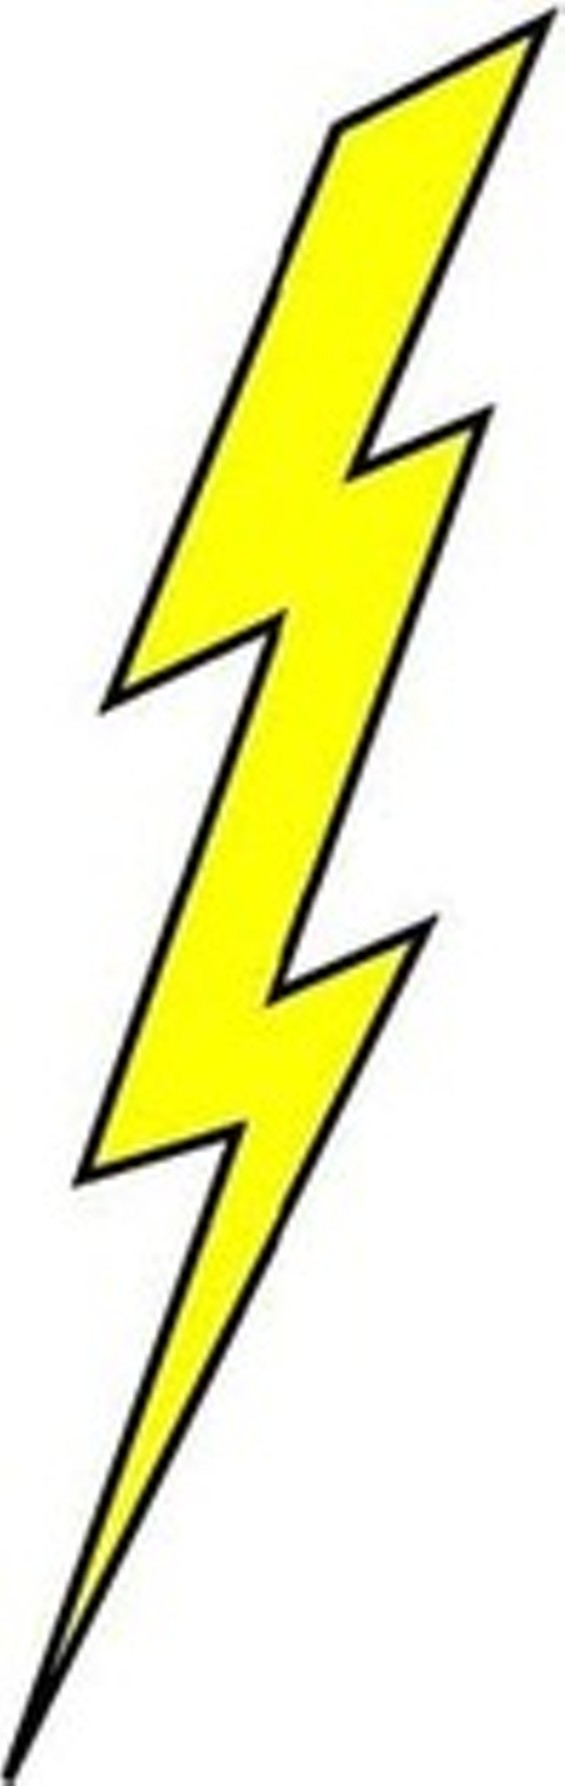 lightning_bolt_thumb_100x313.jpg